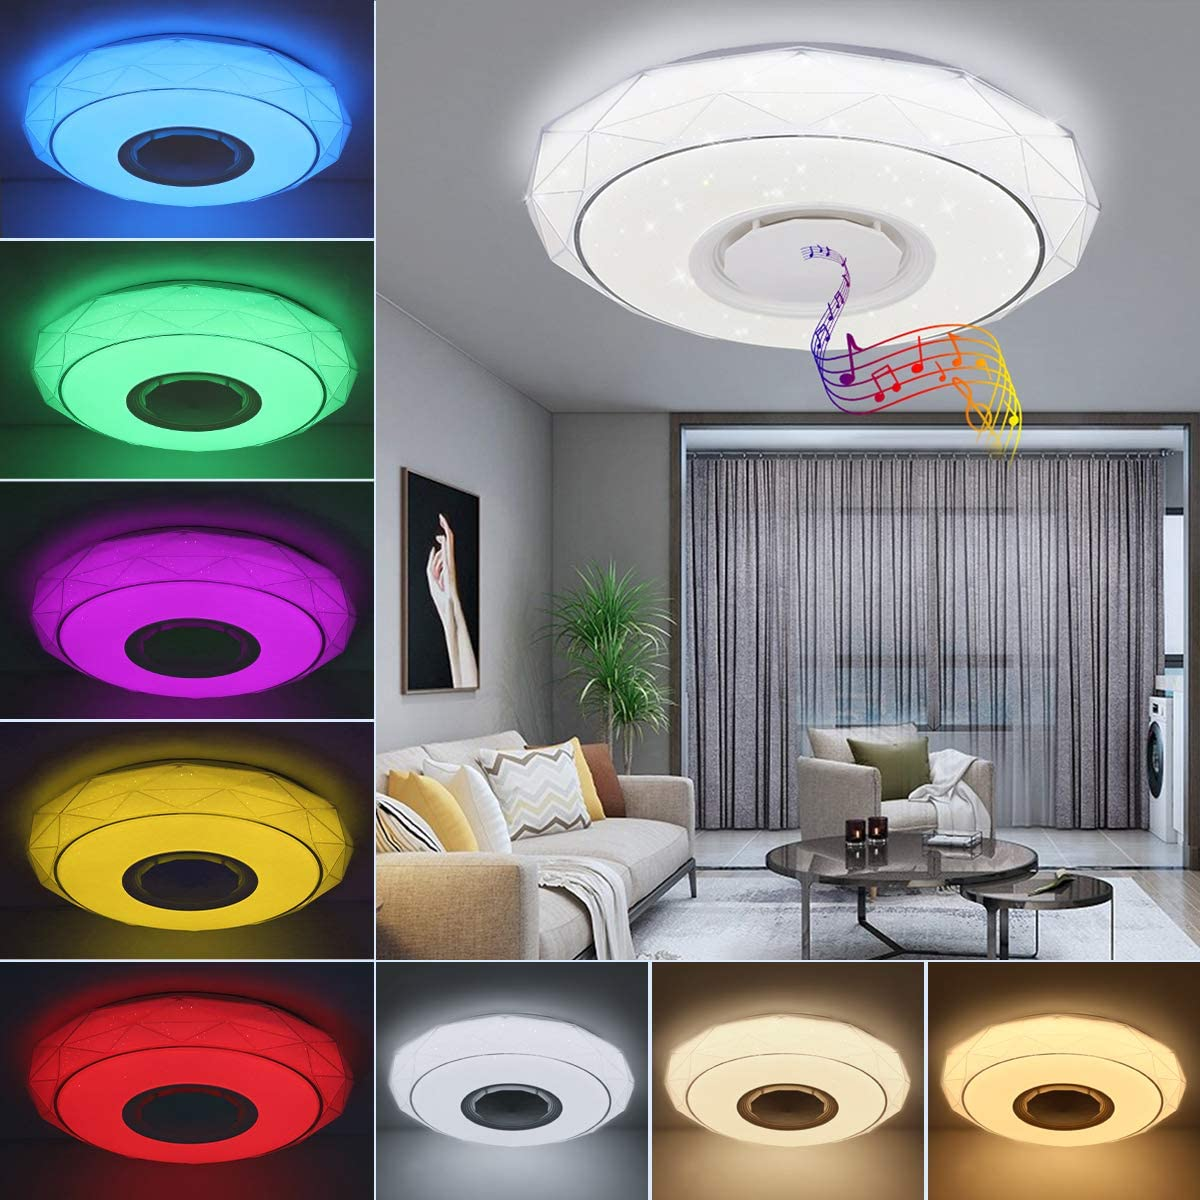 SHILOOK Lámpara LED de Techo Regulable con Altavoz Bluetooth, Mando a Distancia y Aplicación, 24W RGB Cambio de Color para Domitorios Juveniles Salón, 3000-6500K Estrellas Moderna Redonda 40cm